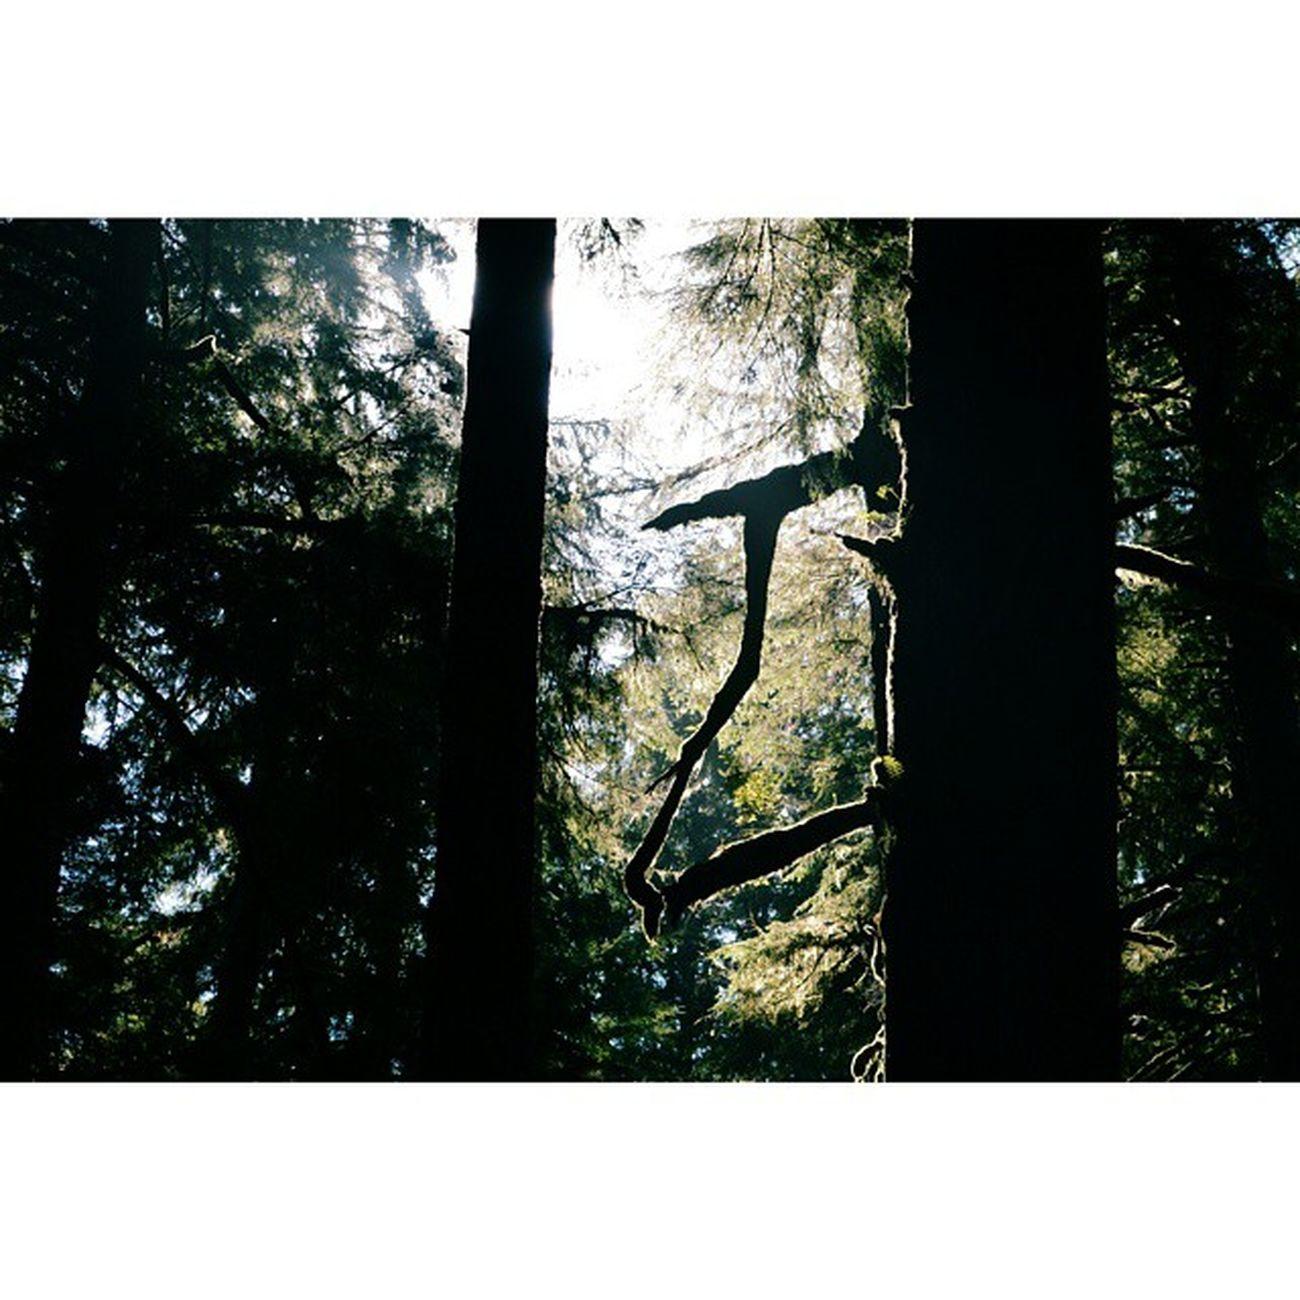 Olympicnationalpark PNW Thegreatpnw Washingtonstate Trees Forest Shadows Capturinglight Vscocam VSCO Nikond3200